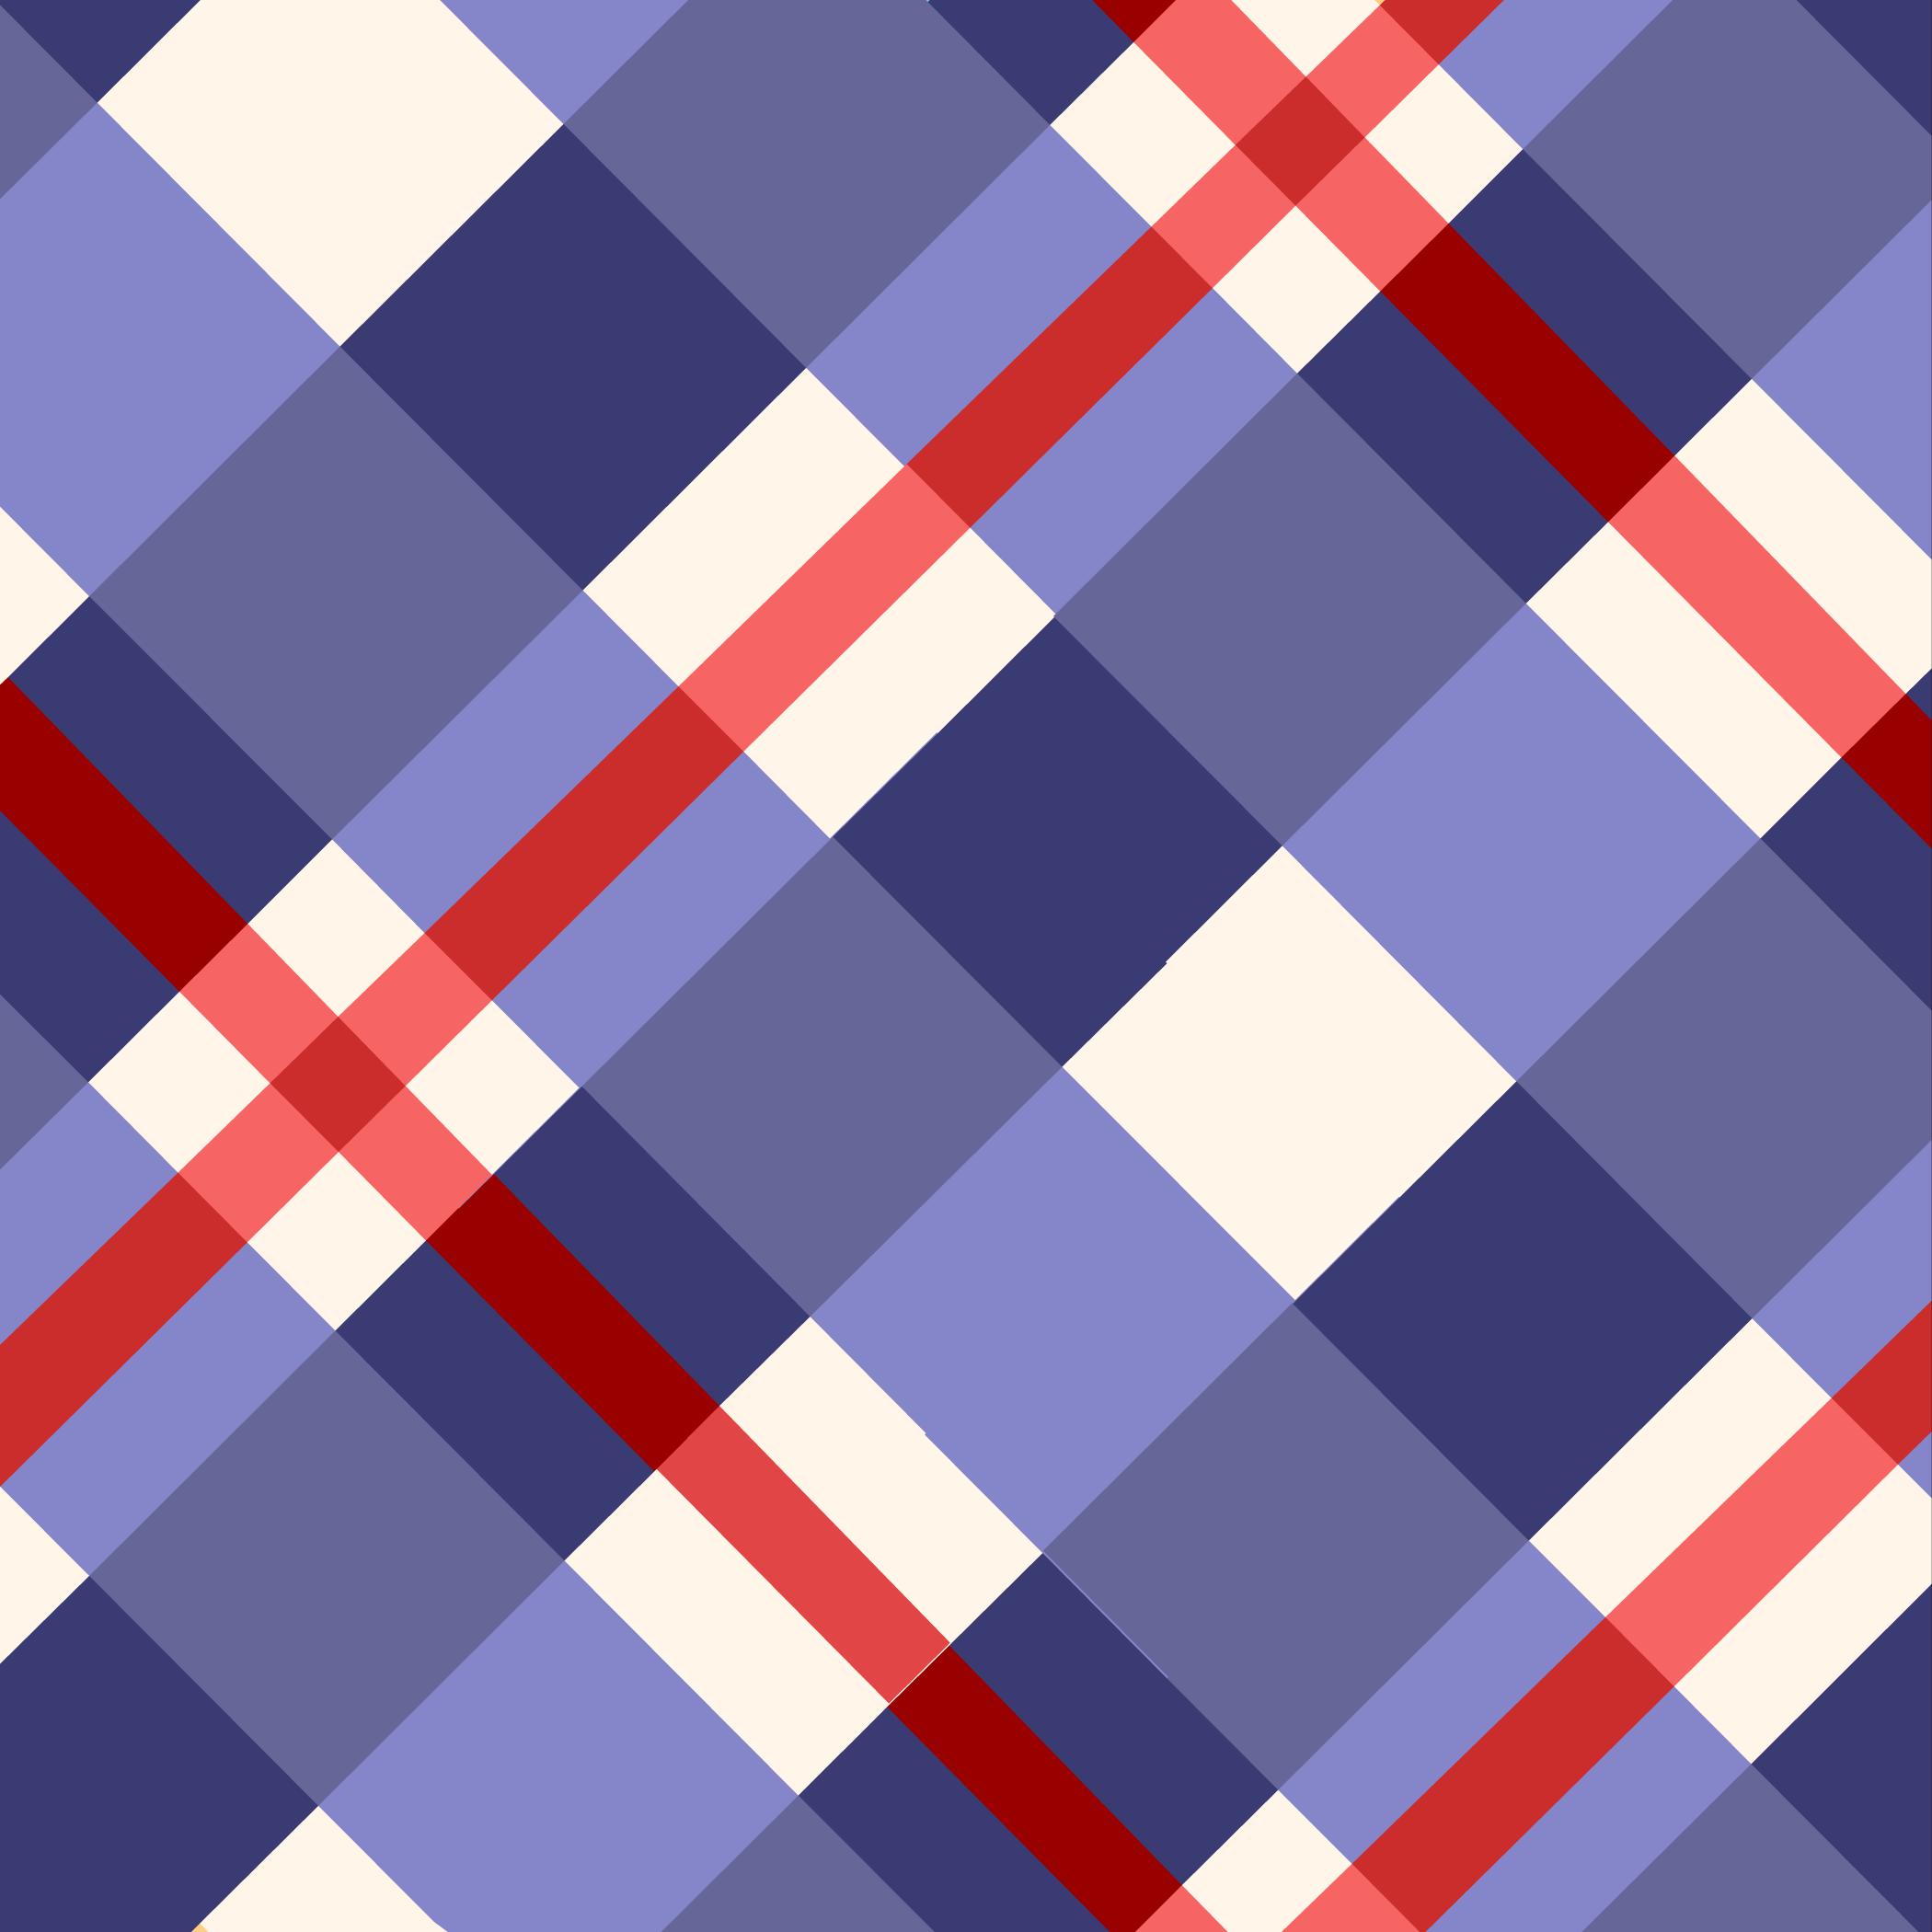 Checkered Wallpaper: Blue And Green Plaid Wallpaper